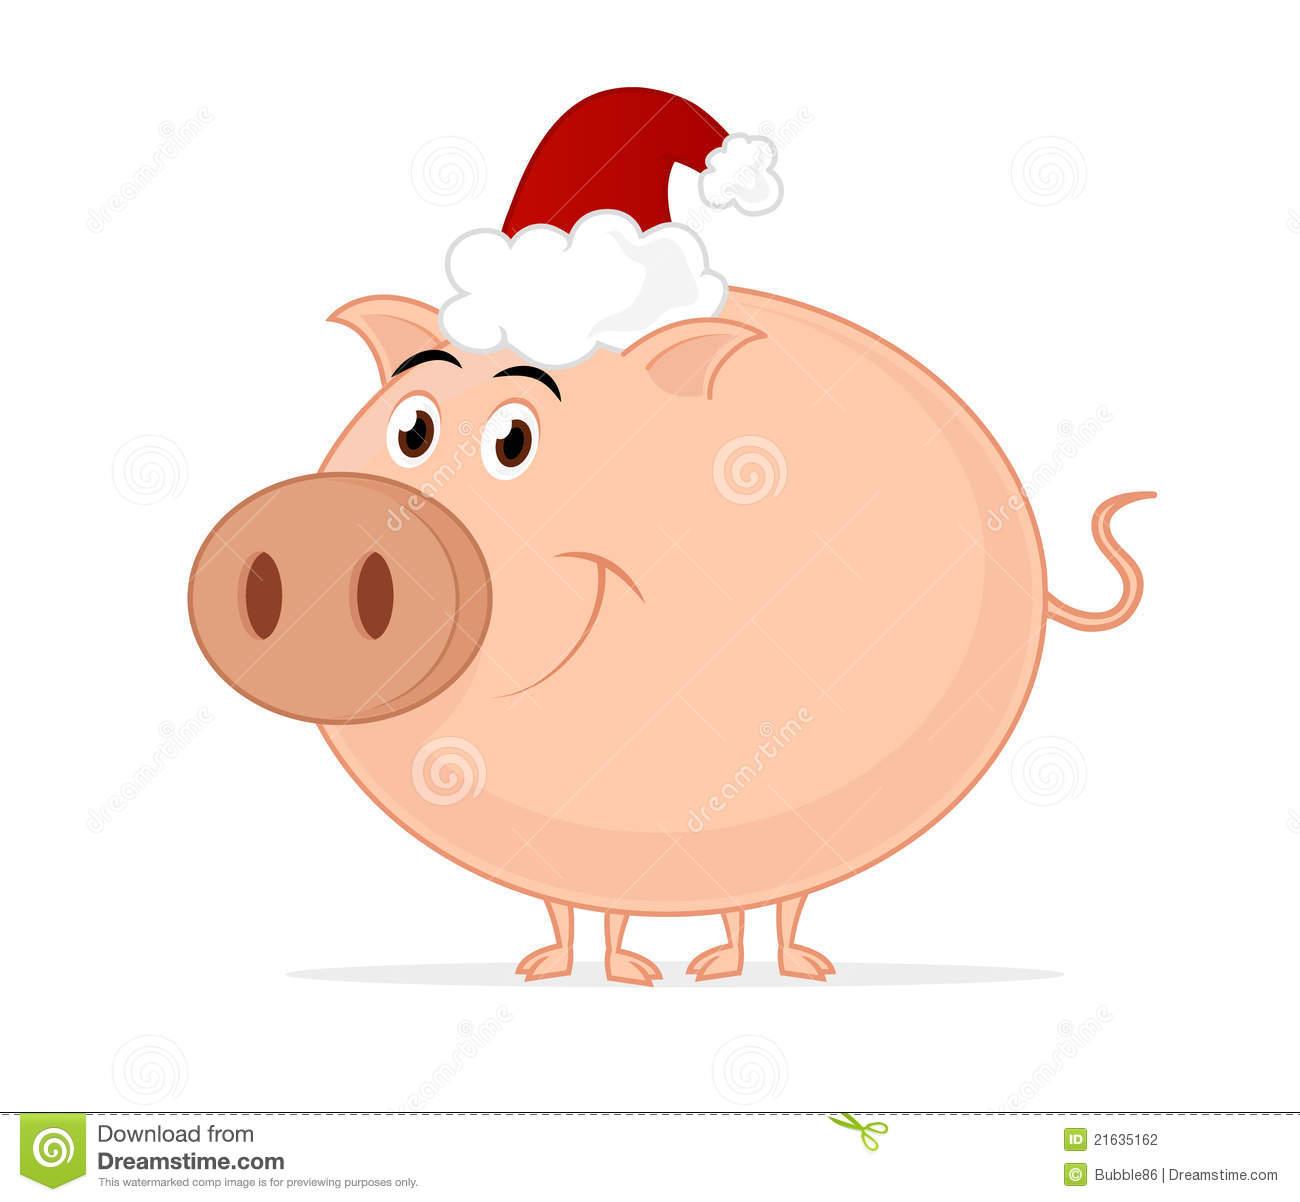 Santa clipart pig.